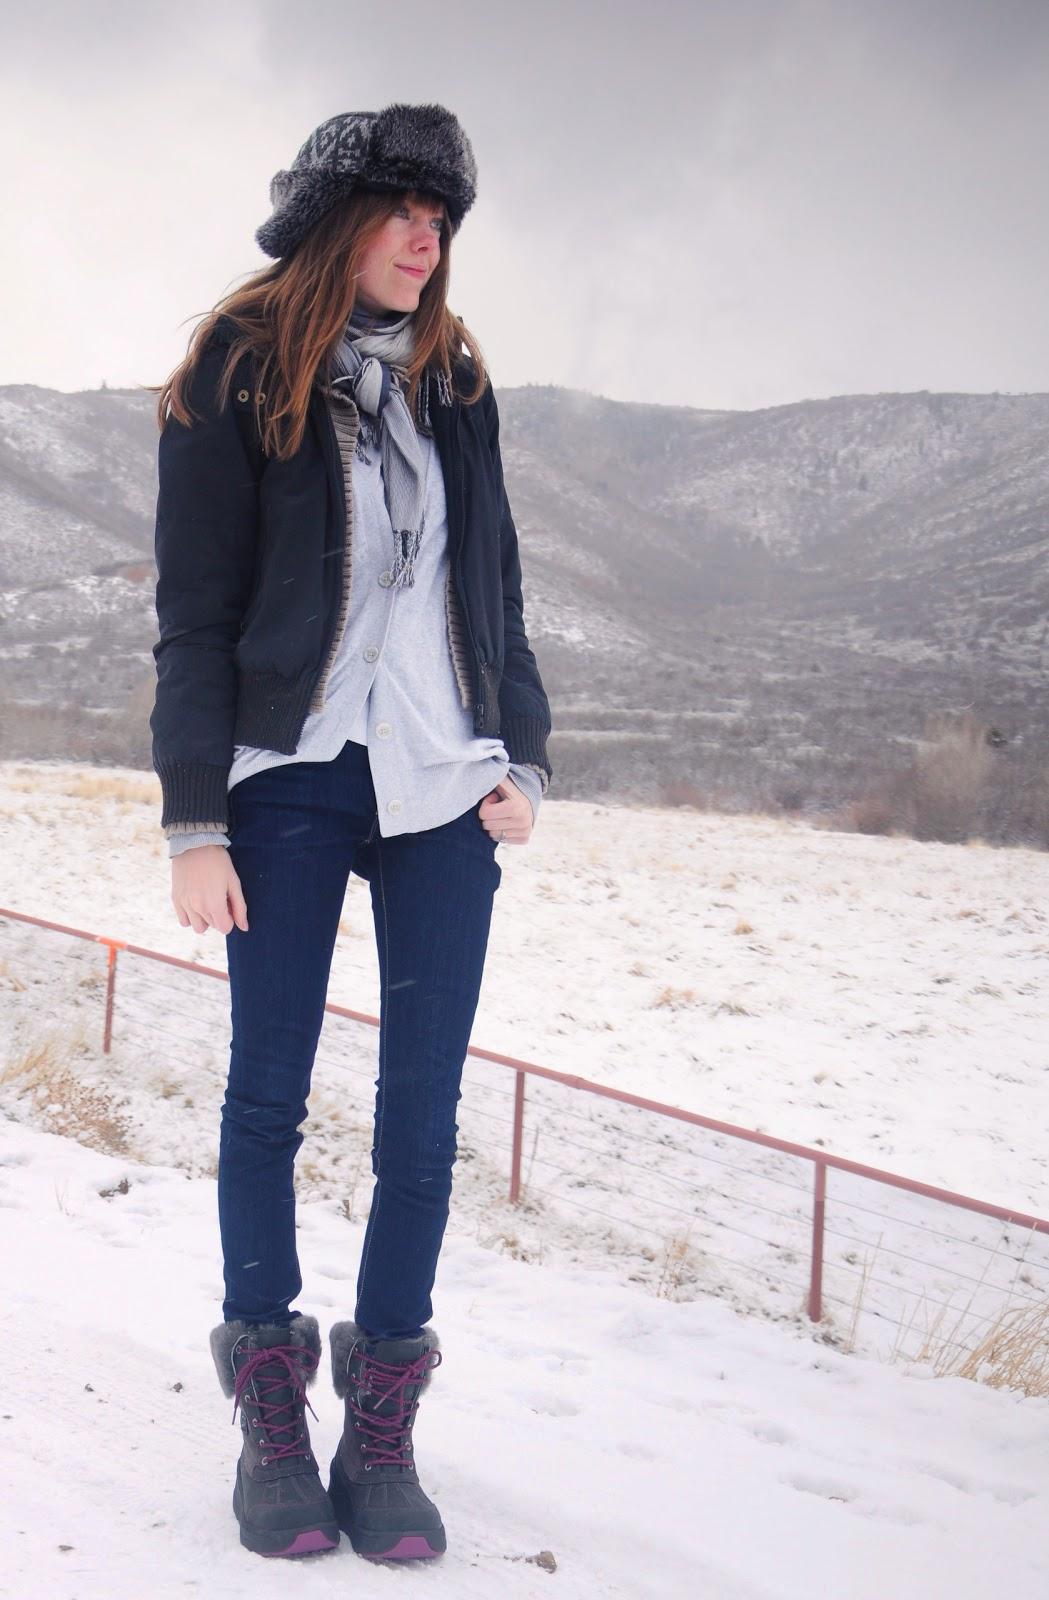 Winter hiking fashion; UGG snow boots